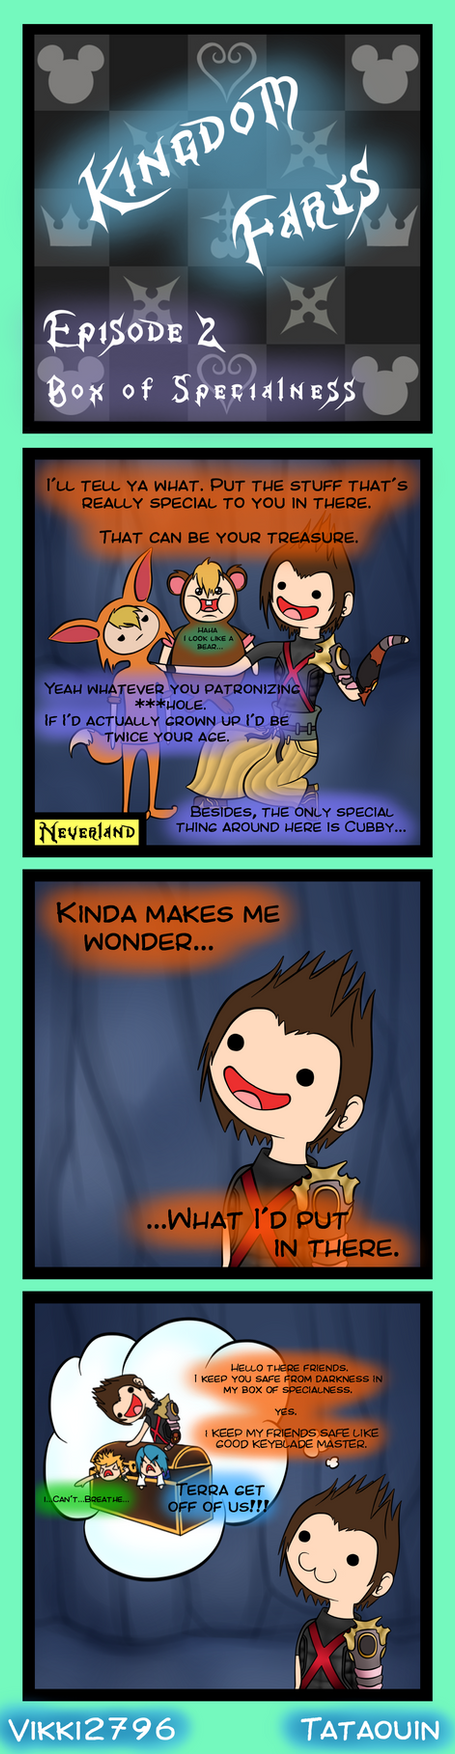 Kingdom Farts Episode 2 - Box Of Specialness by HeyVikkiTime